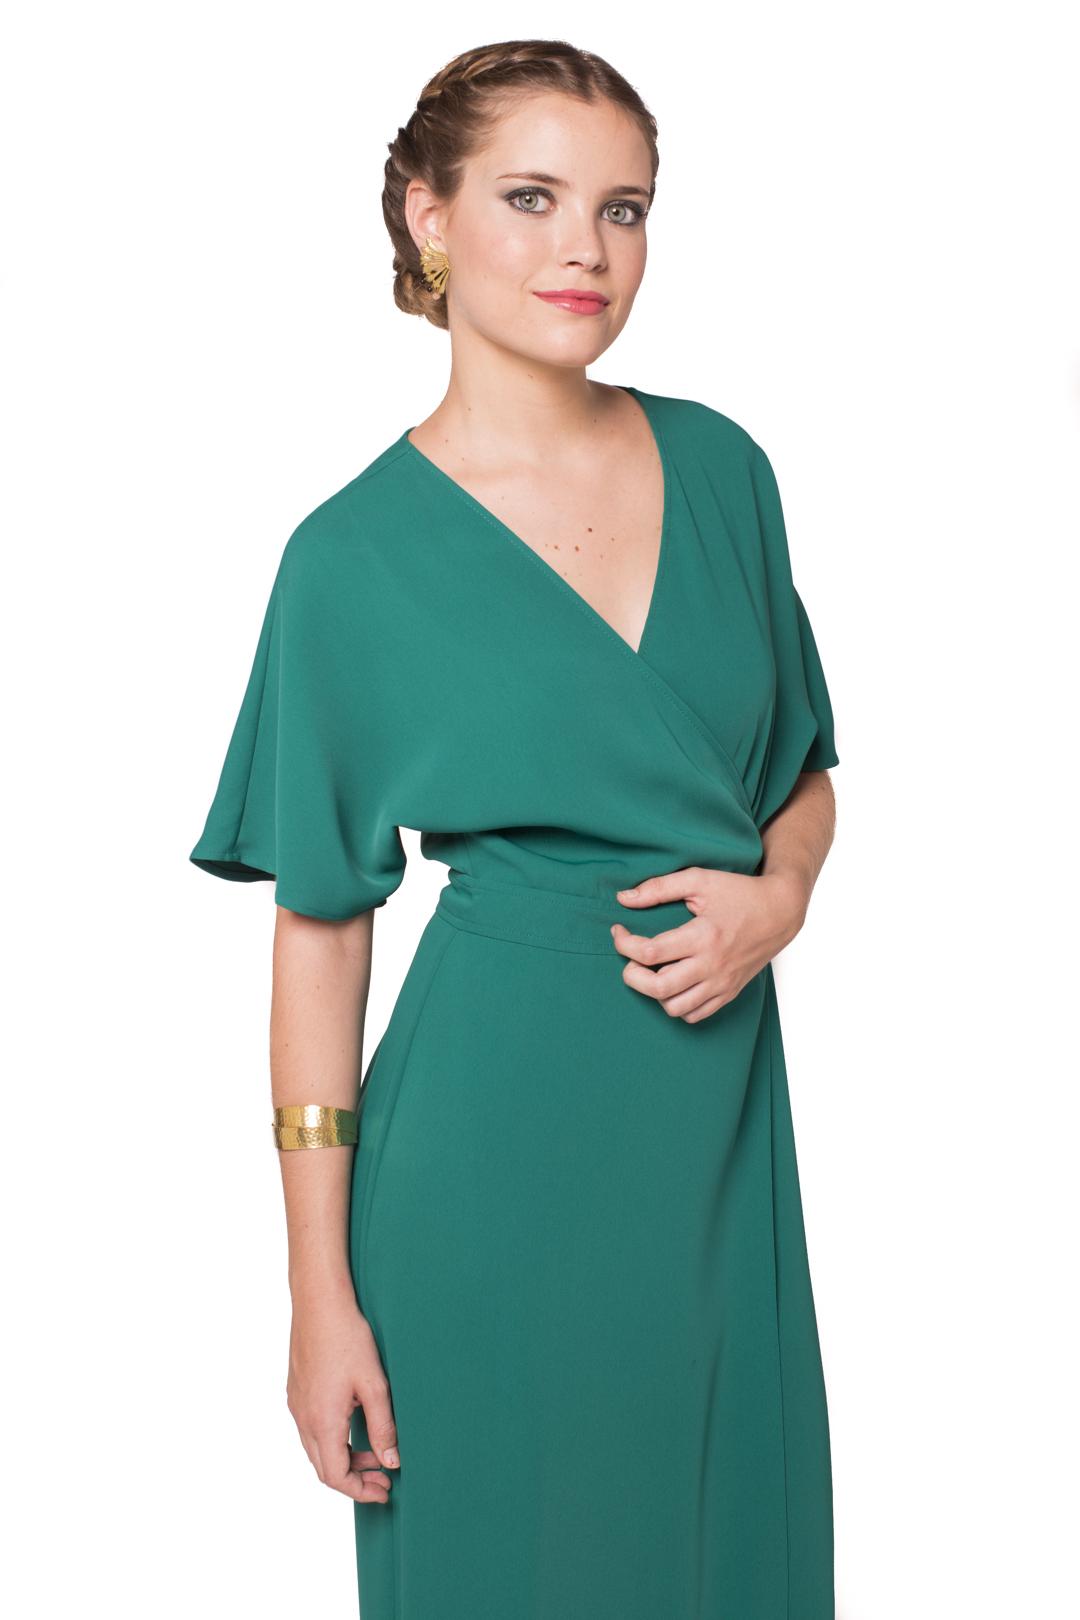 Vestido Green Kimono - Alquiler de Vestidos - La Más Mona